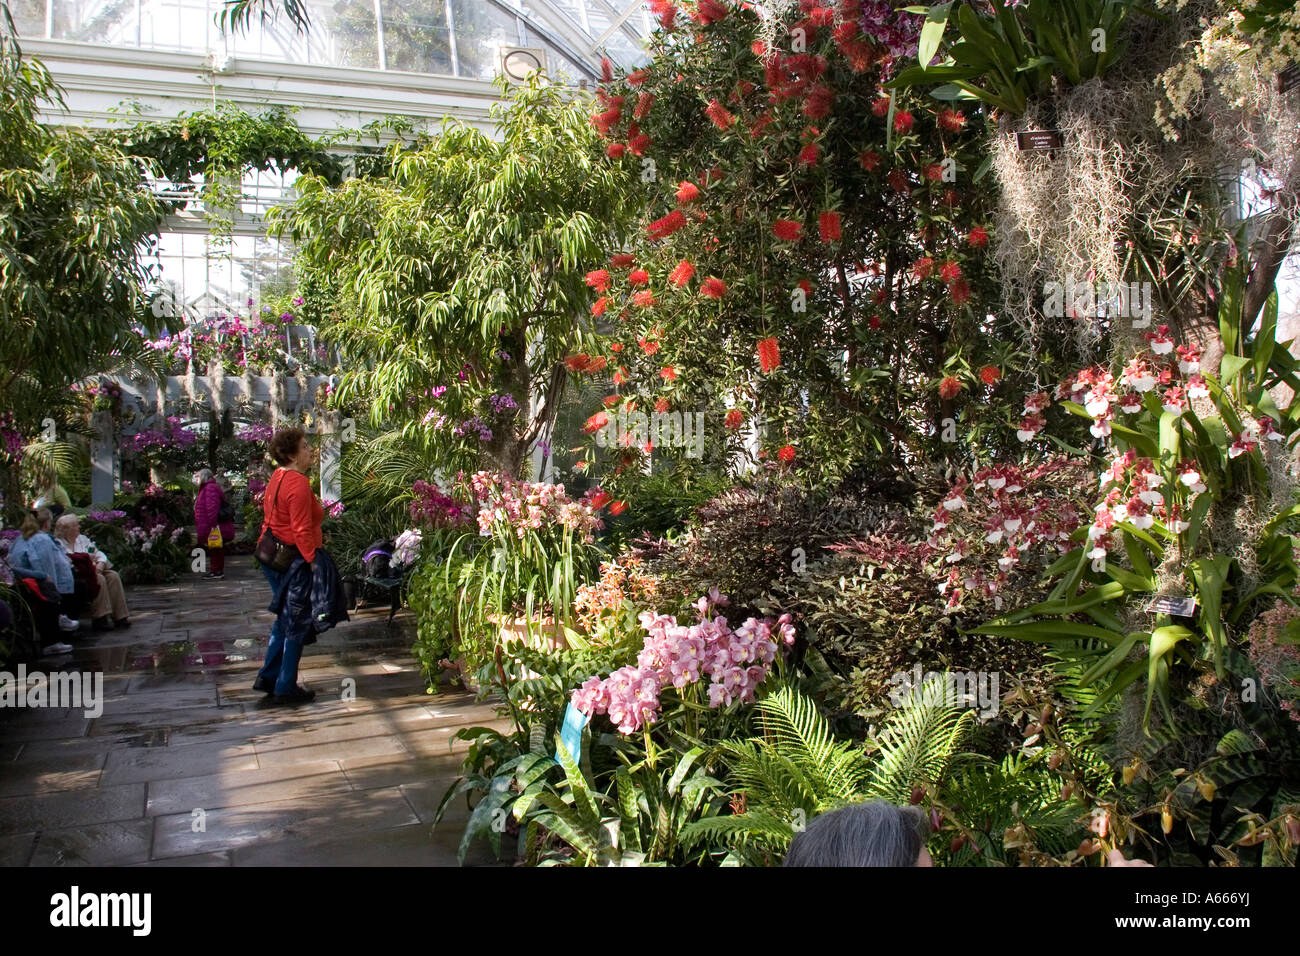 Usa New York Botanical Gardens Stock Photos & Usa New York Botanical ...